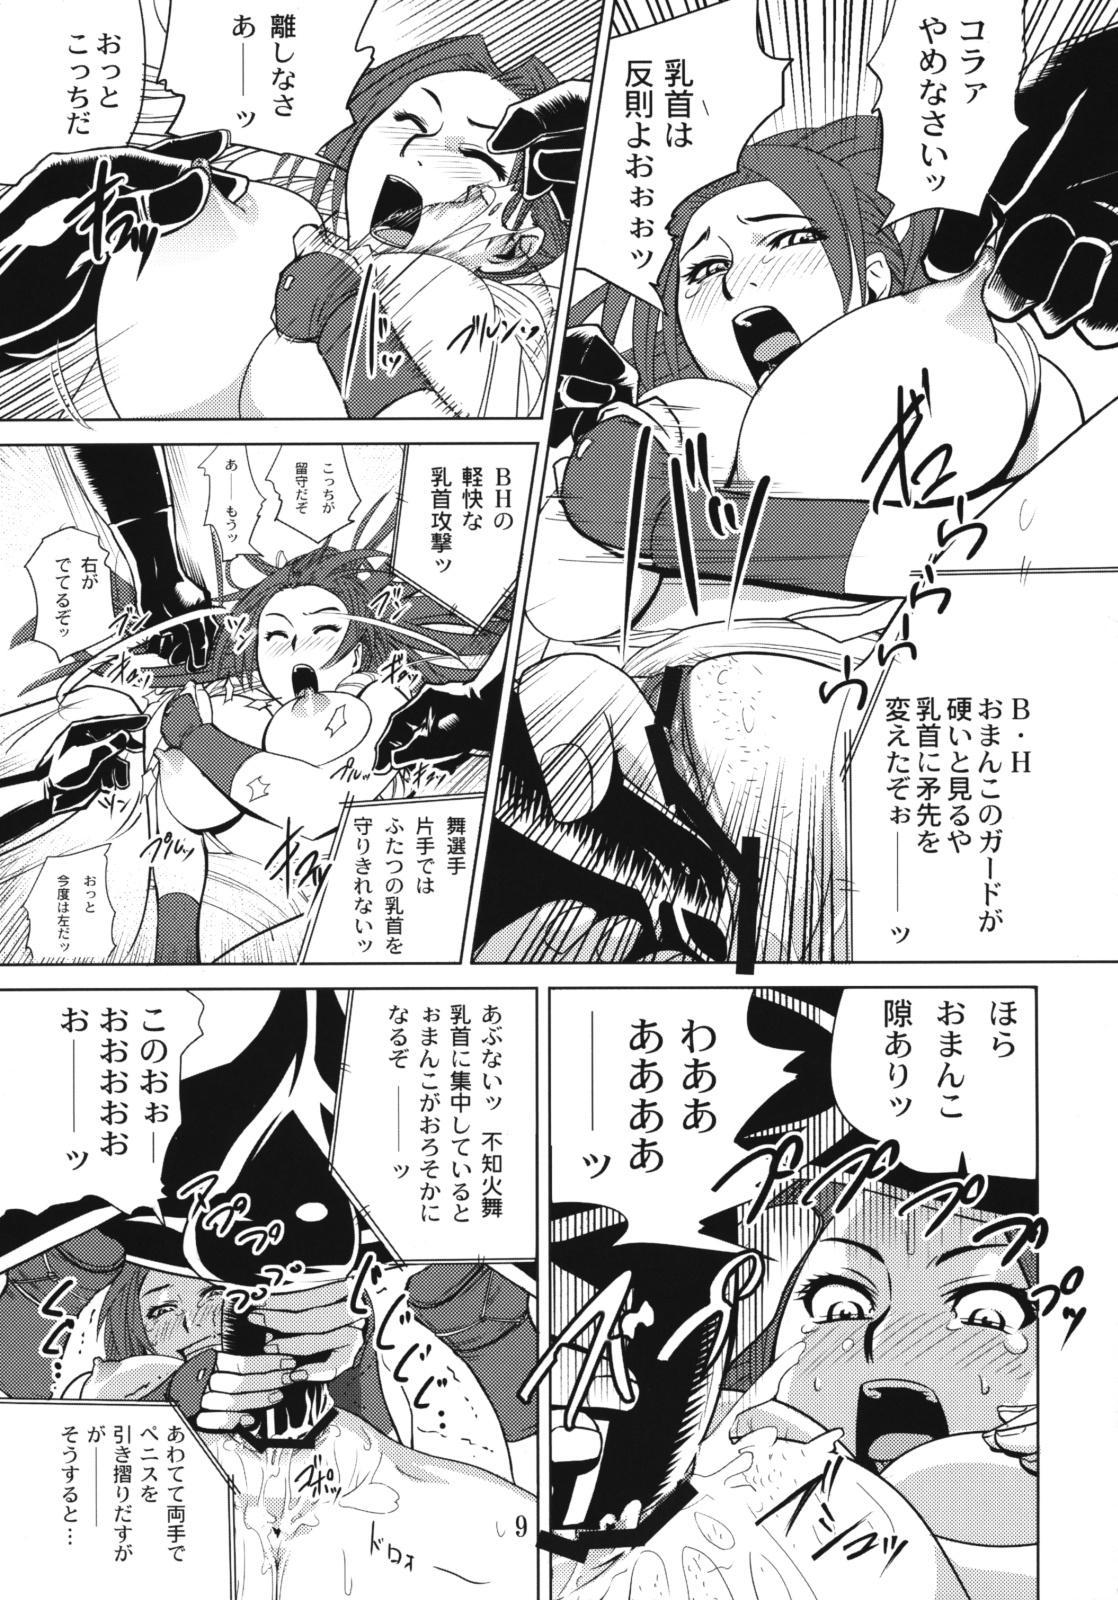 Yojigen Sappou Combi vs Shiranui Mai Round 2 7